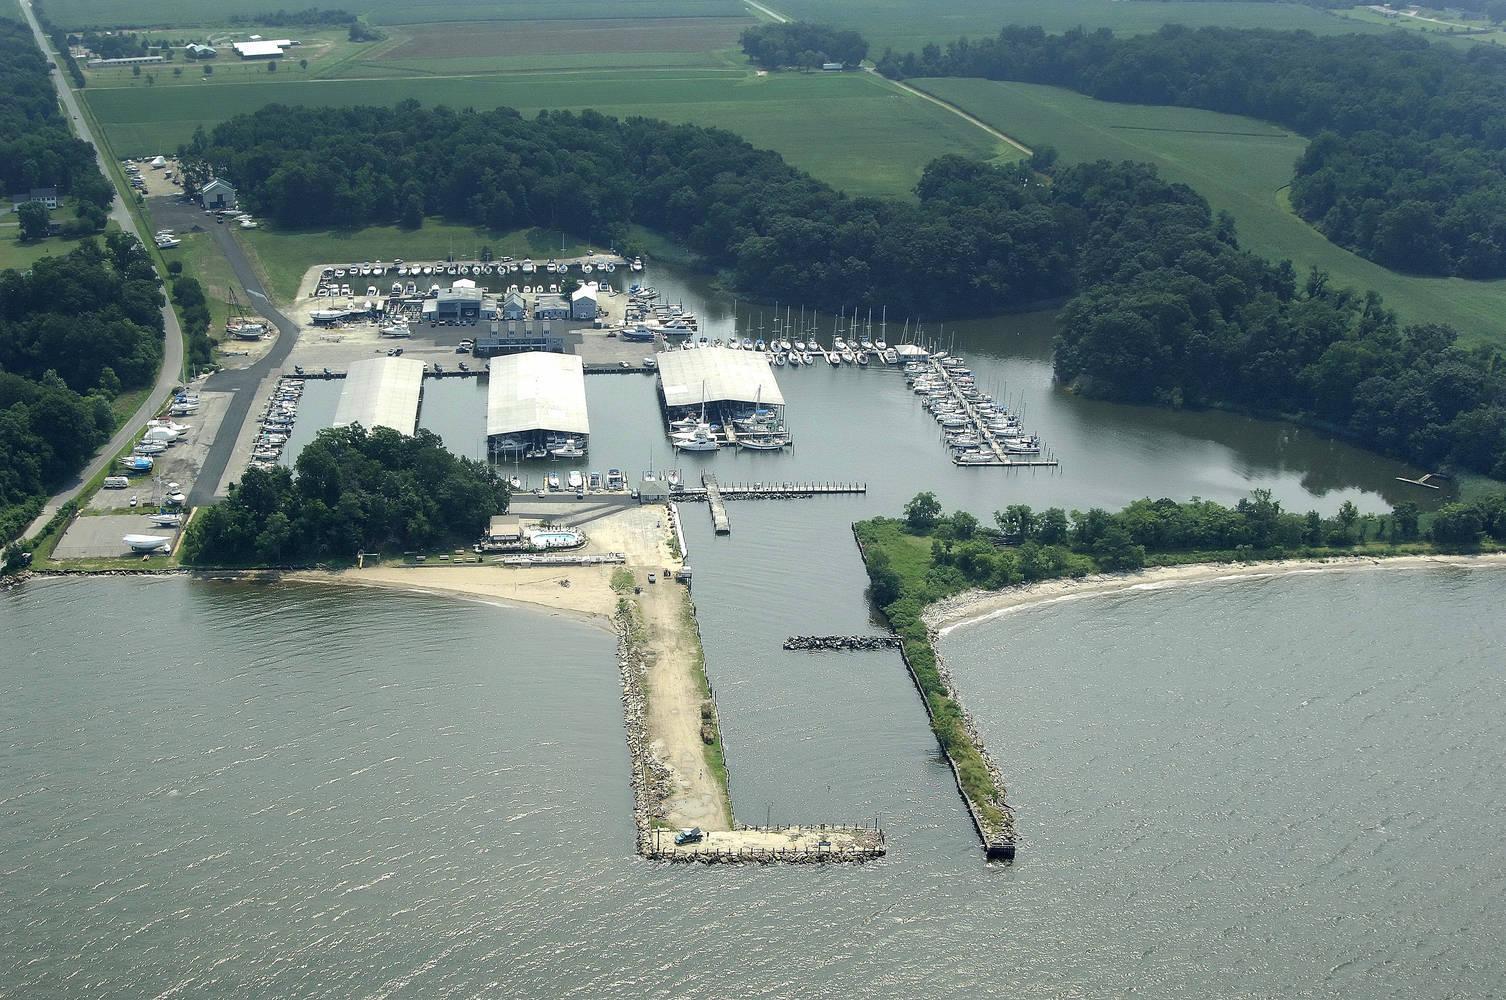 Tolchester Marina Slip Dock Mooring Reservations Dockwa